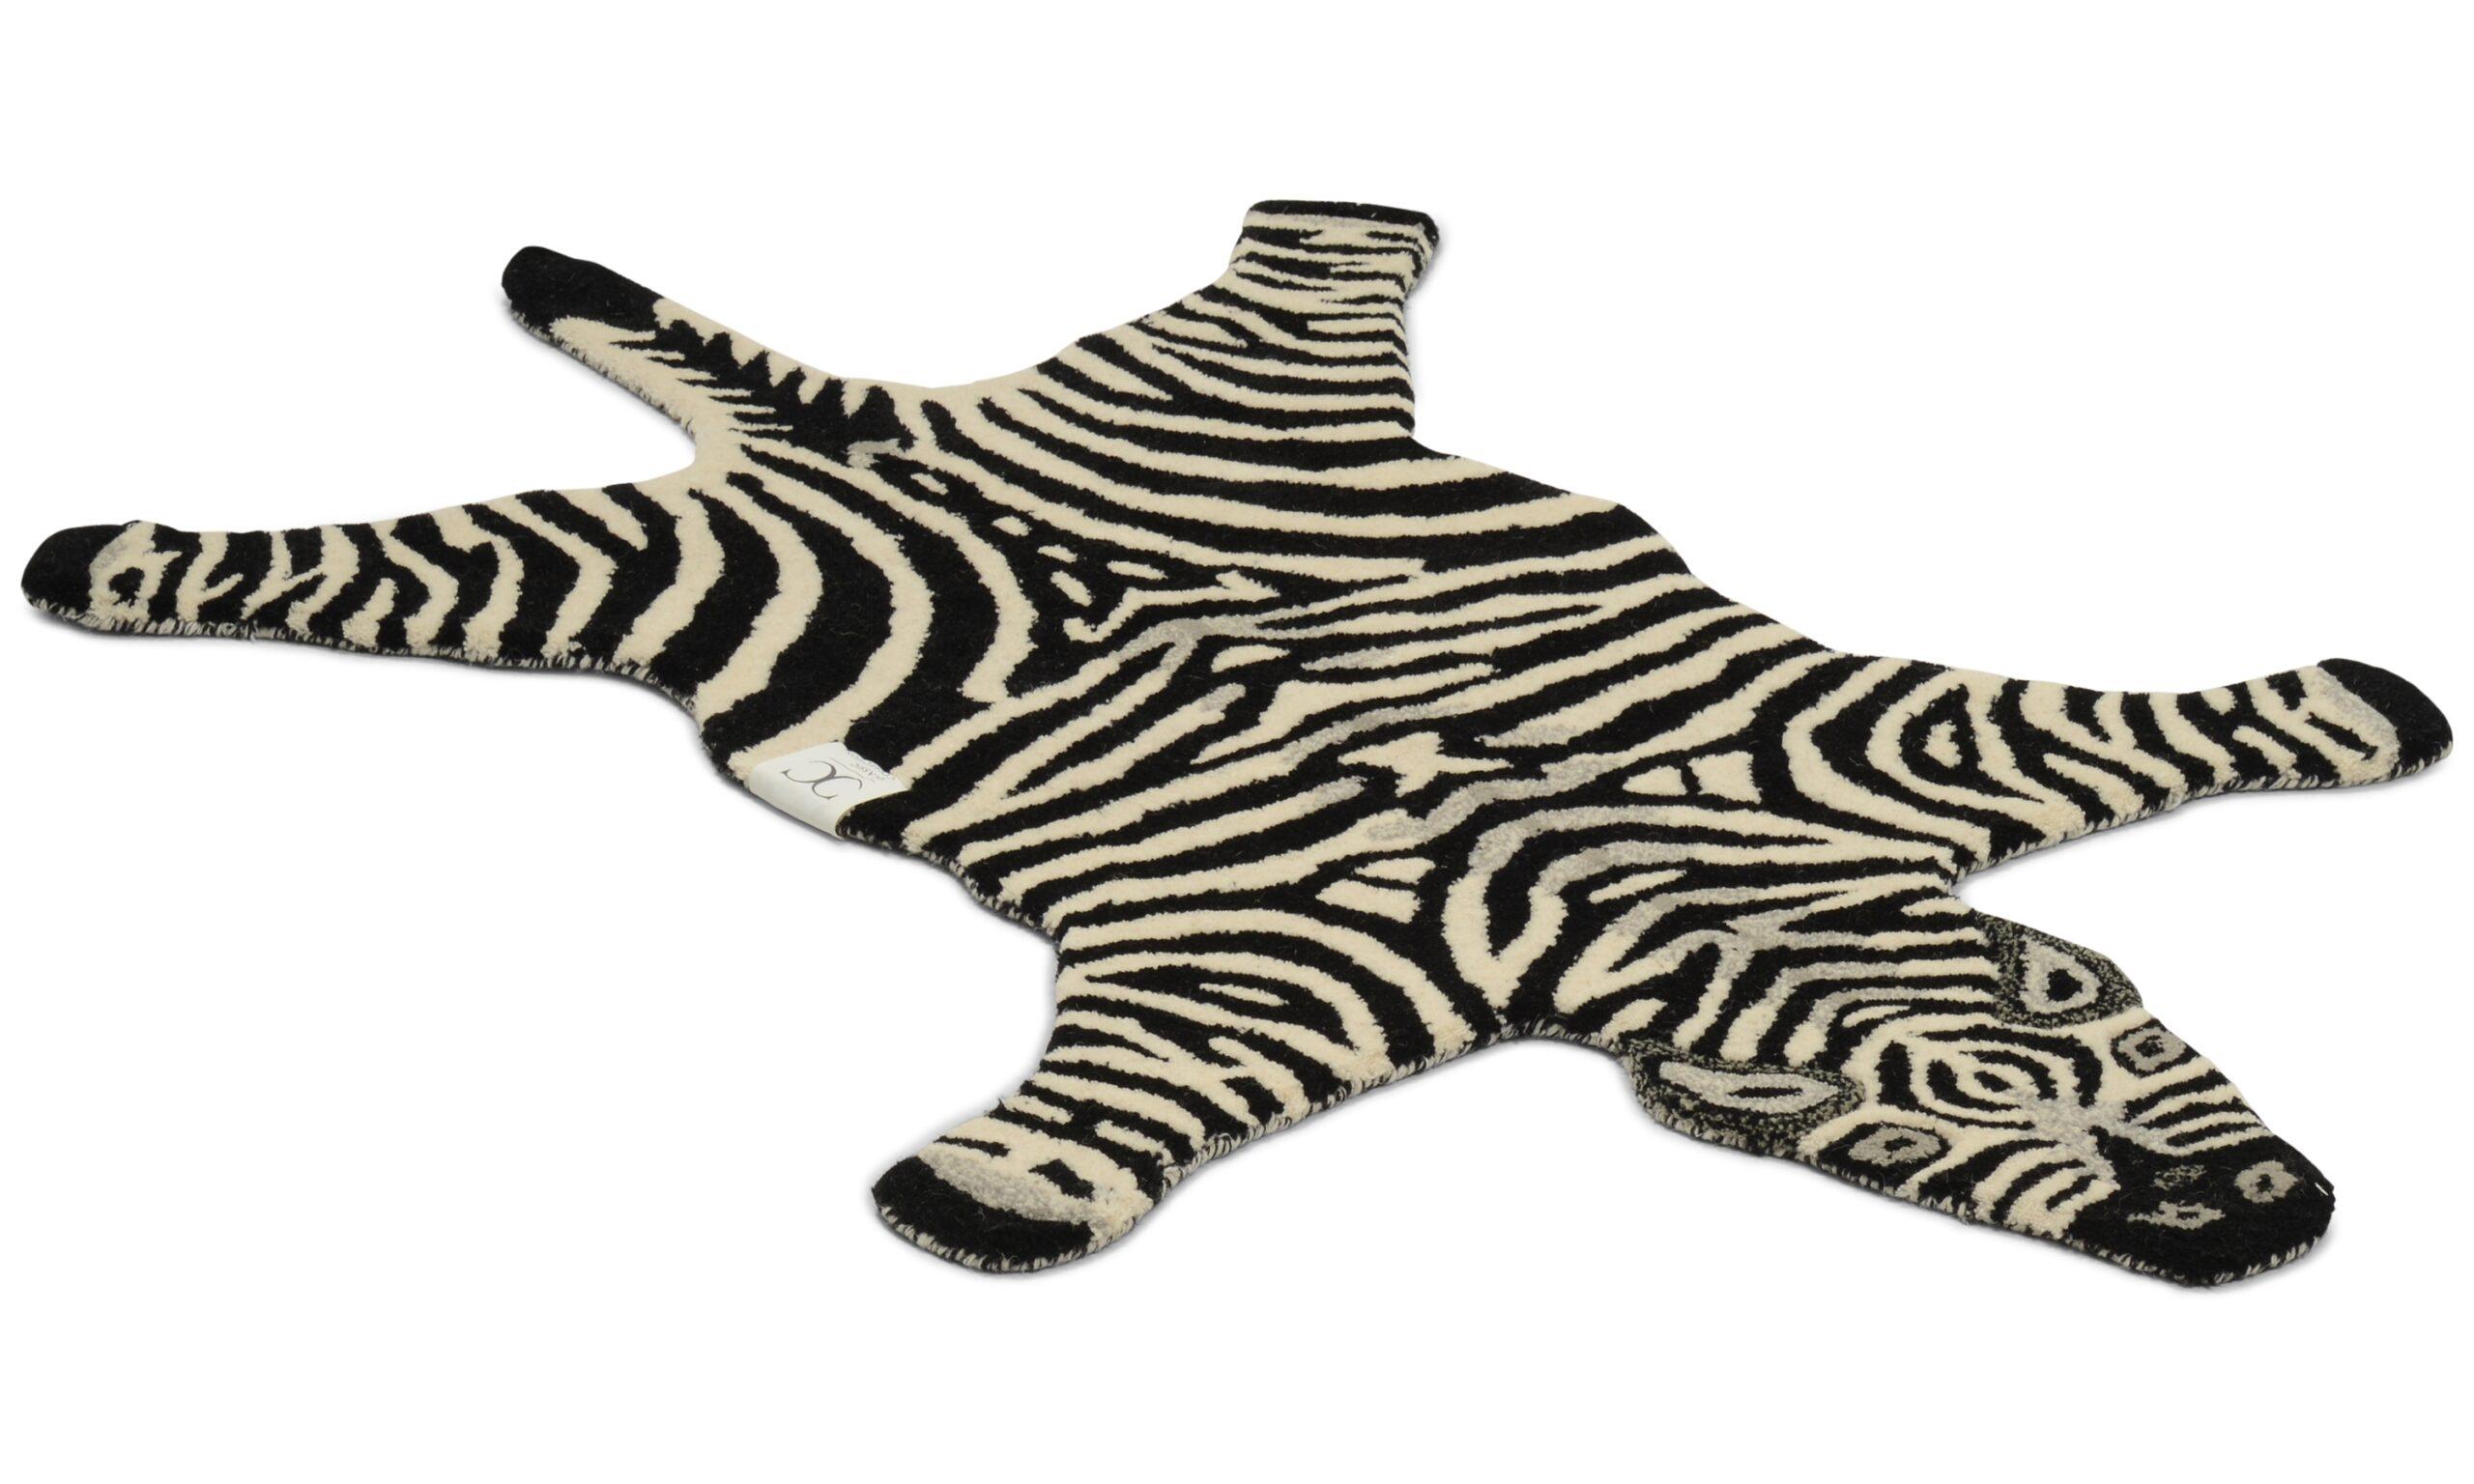 Zebra svart/hvit - håndtuftet teppe